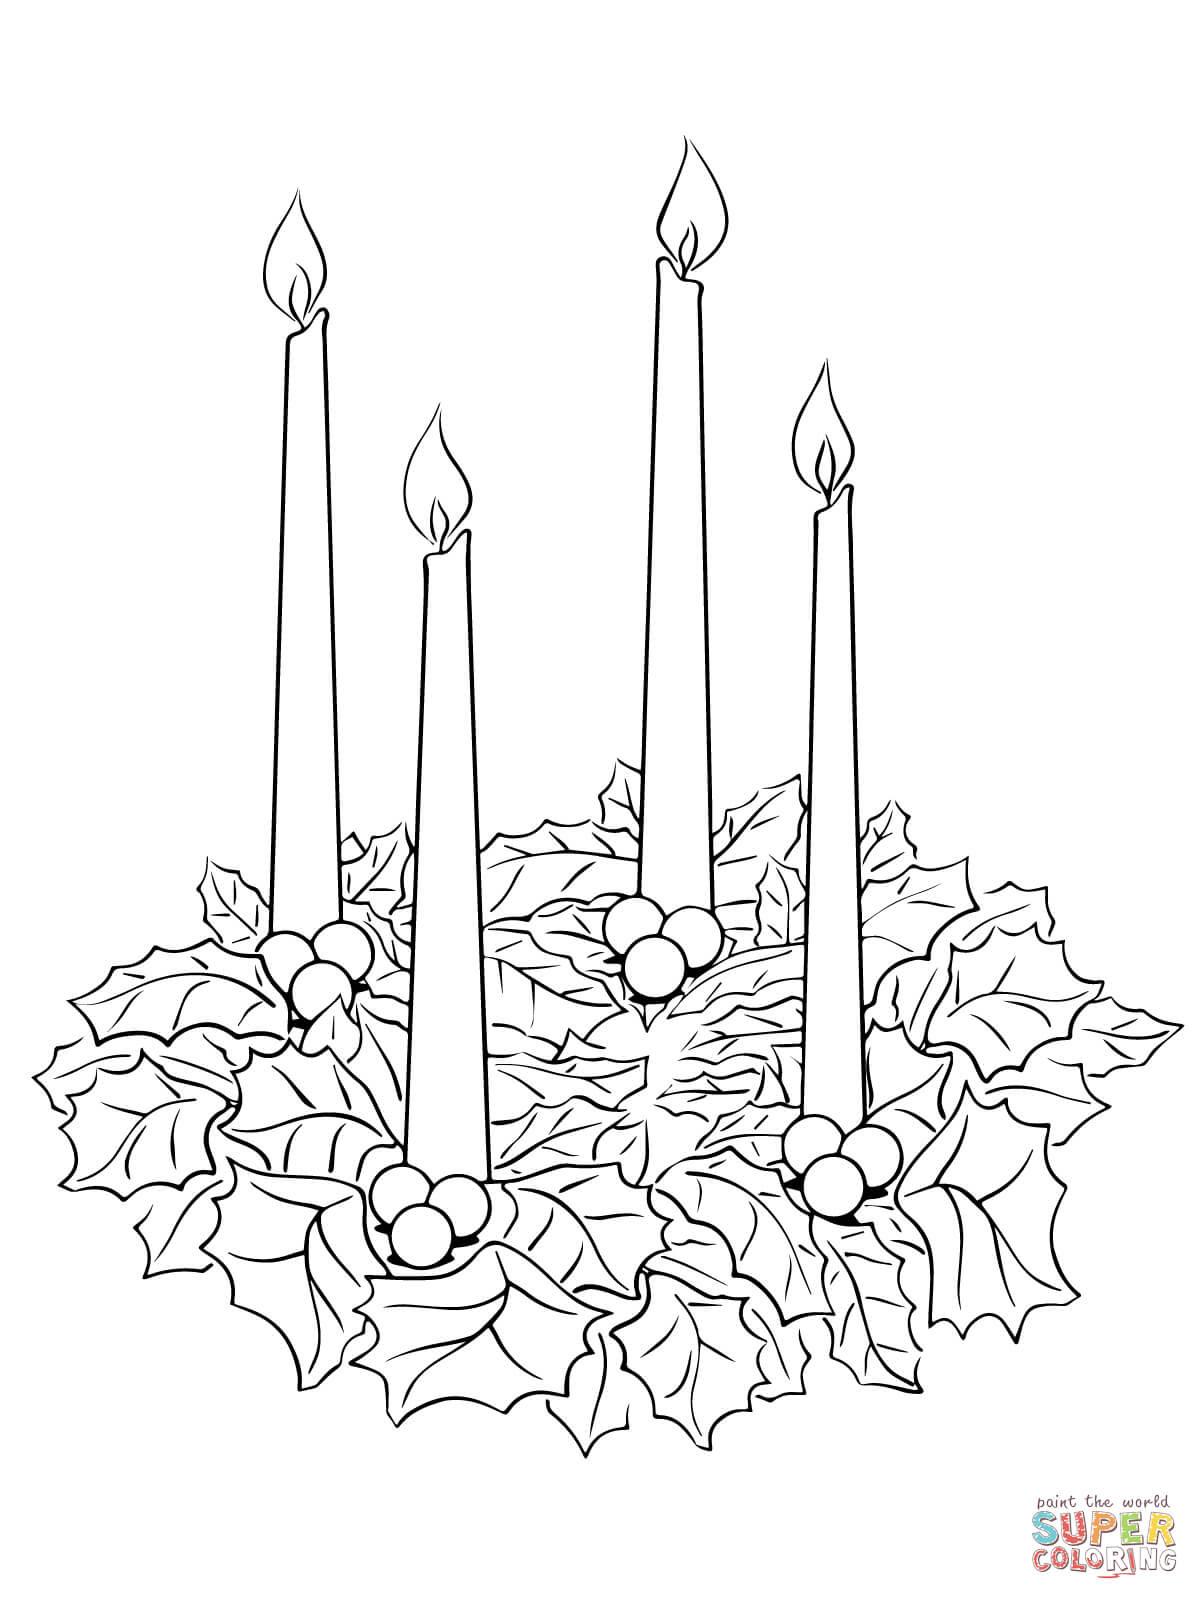 Klick das Bild Adventskranz an